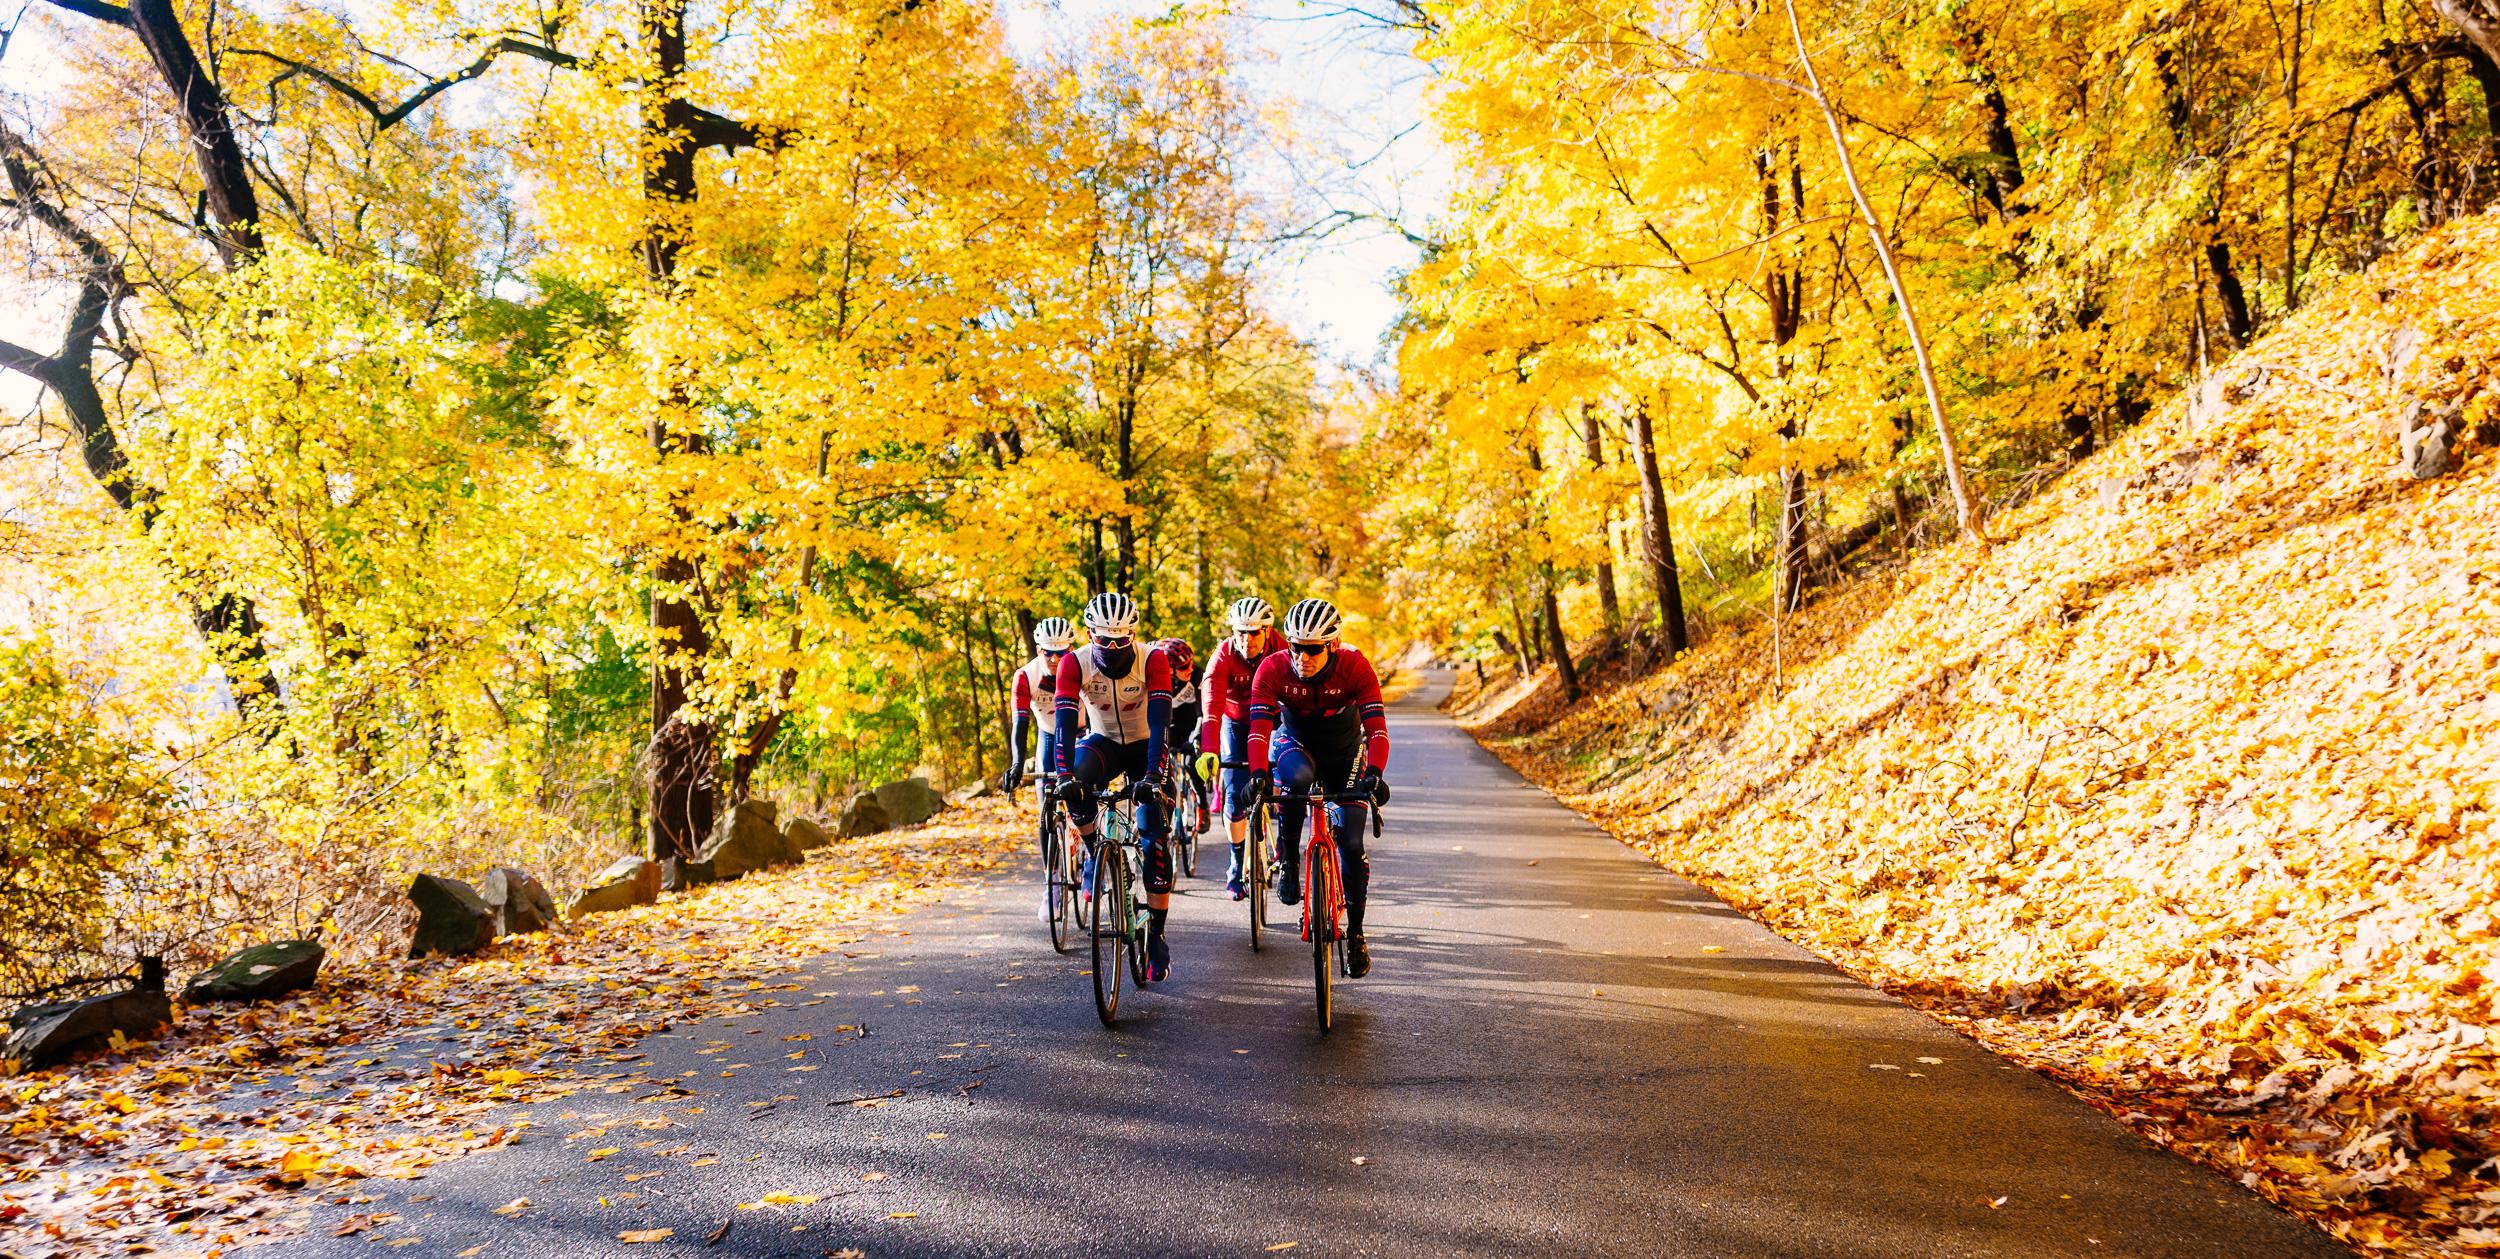 photo-rhetoric-to-be-determined-river-road-fall-foliage-5020.jpg